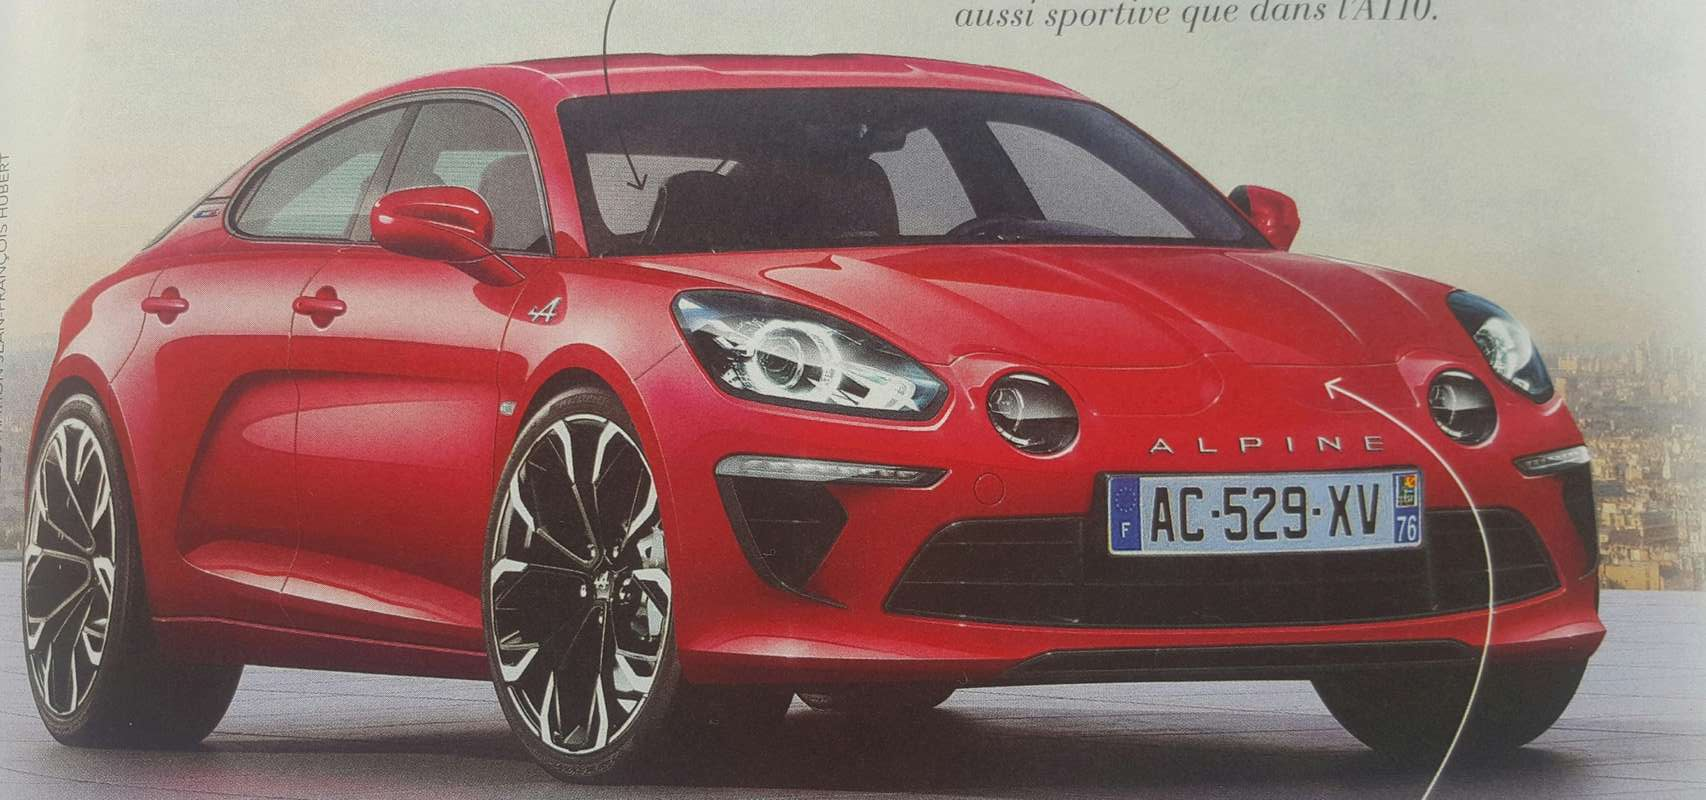 2020 - [Alpine] GT 4 portes 20170514